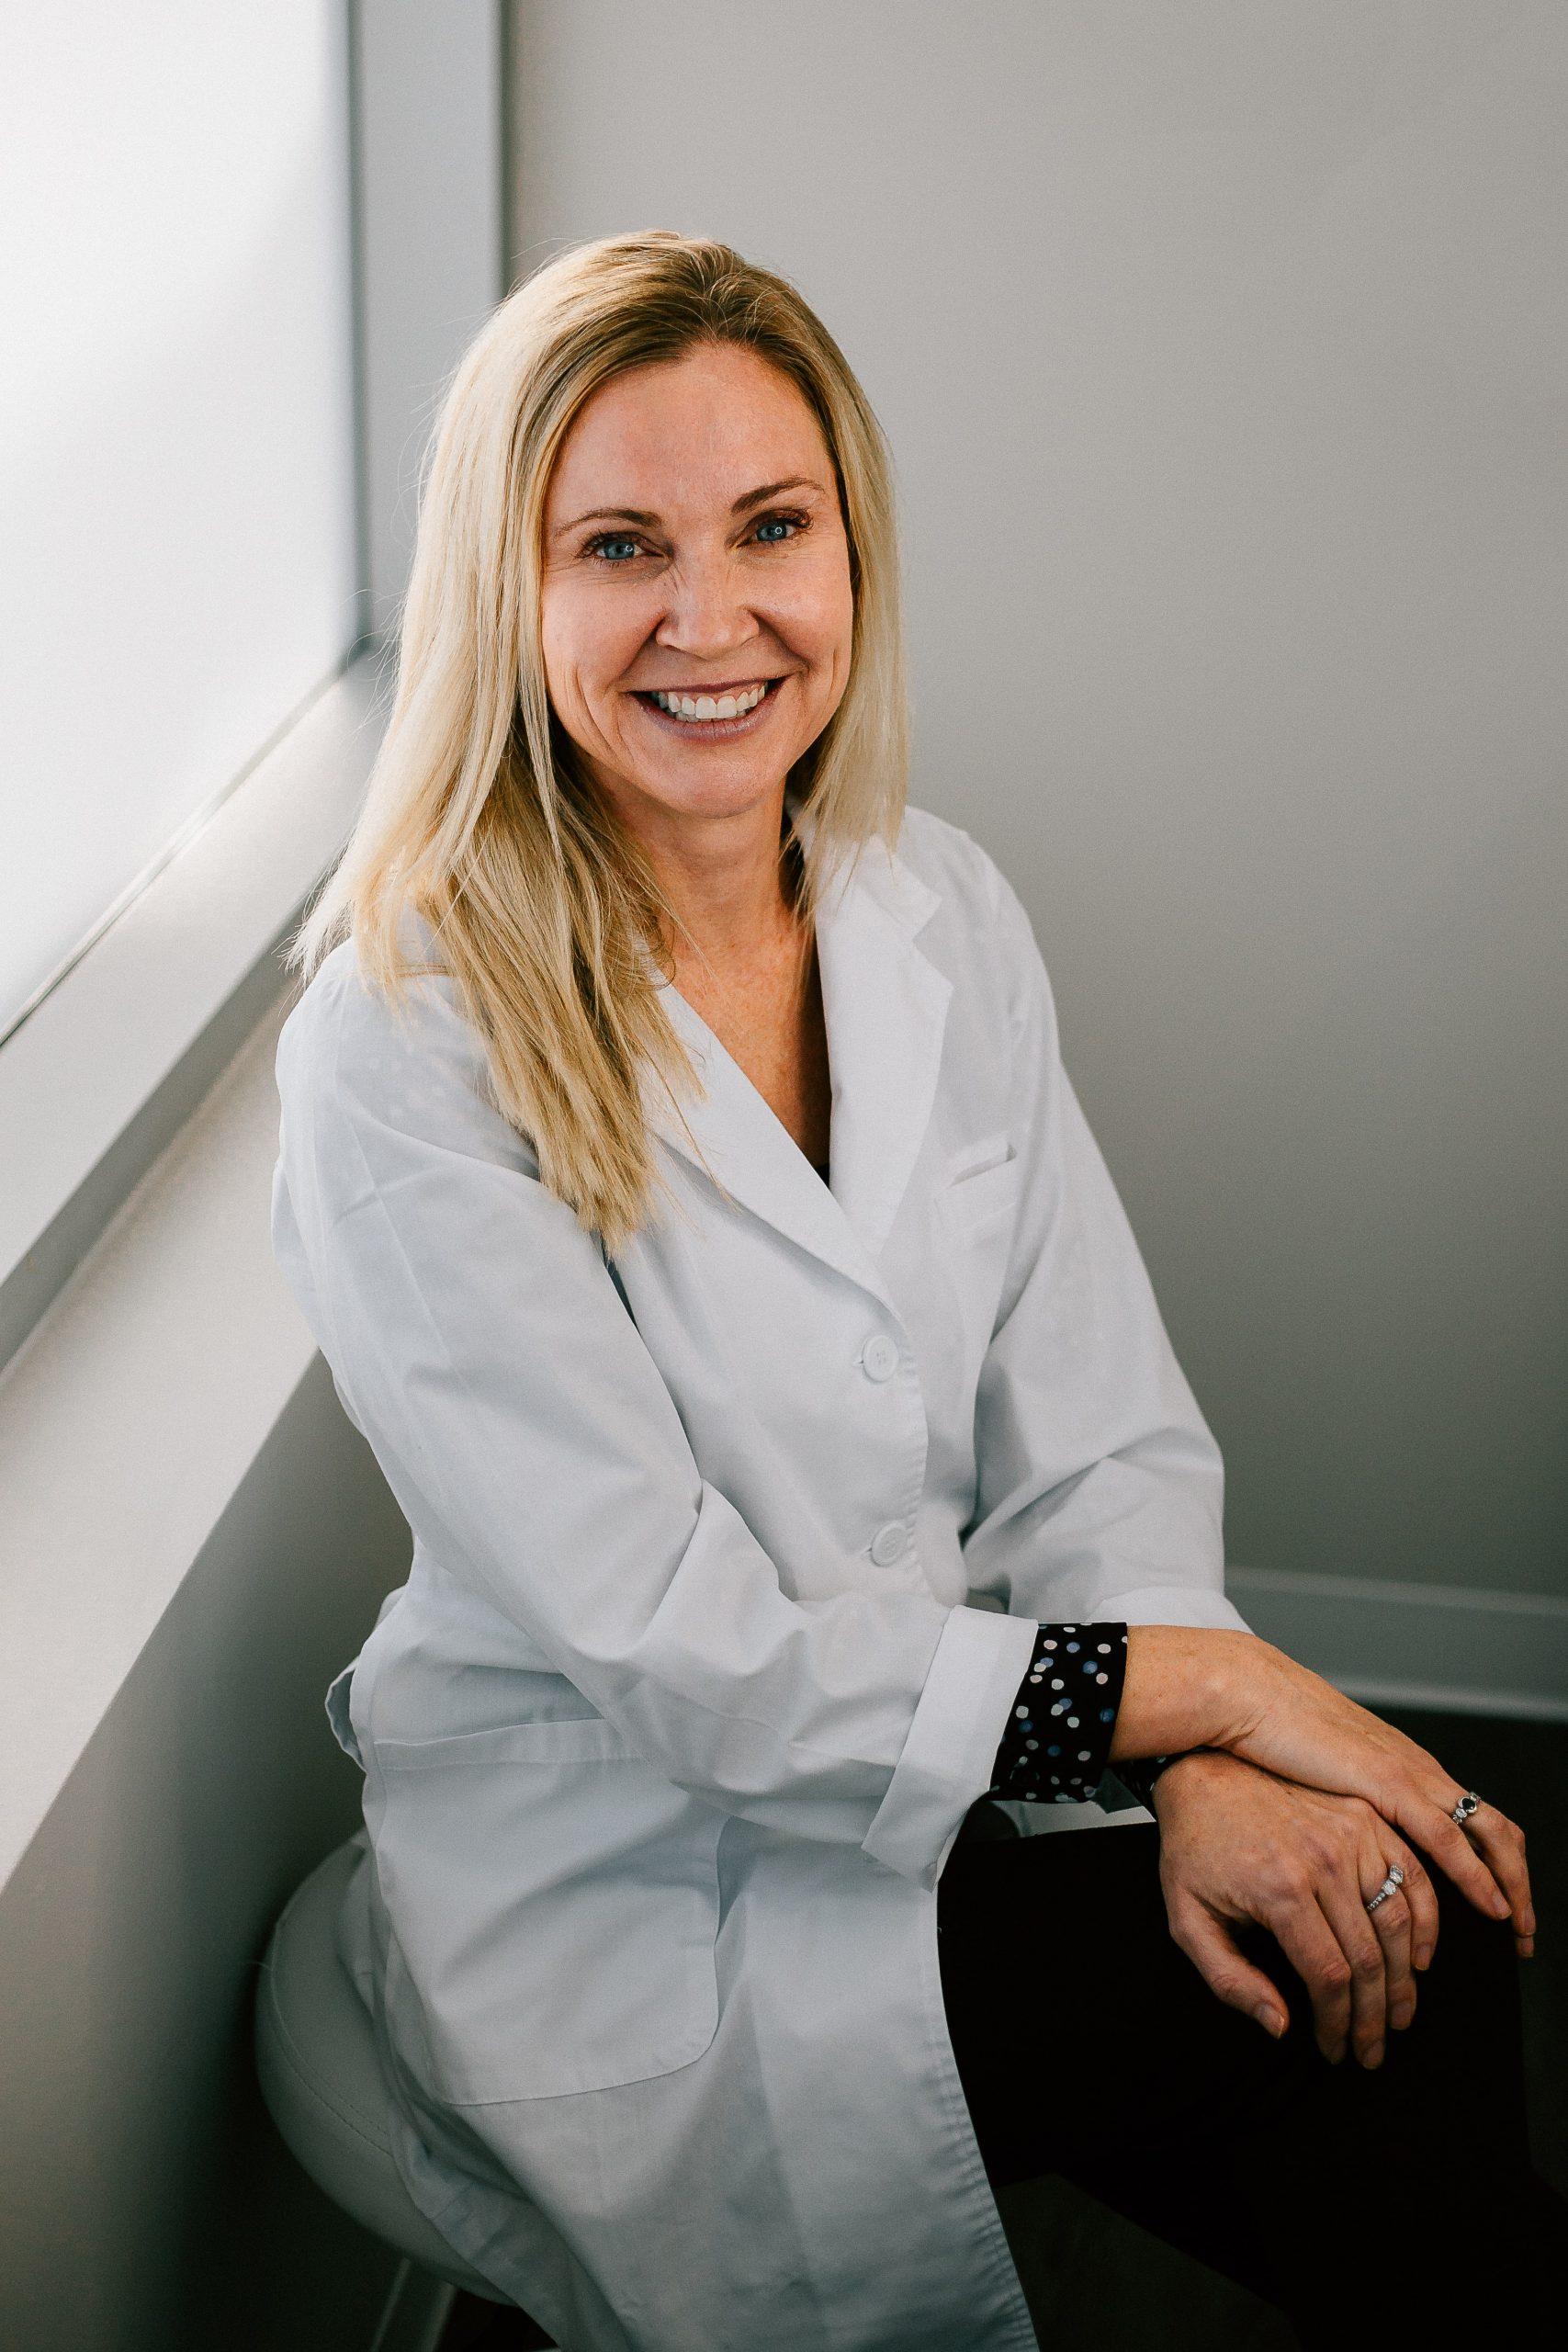 Dr. Kathryn Wentworth skin care expert